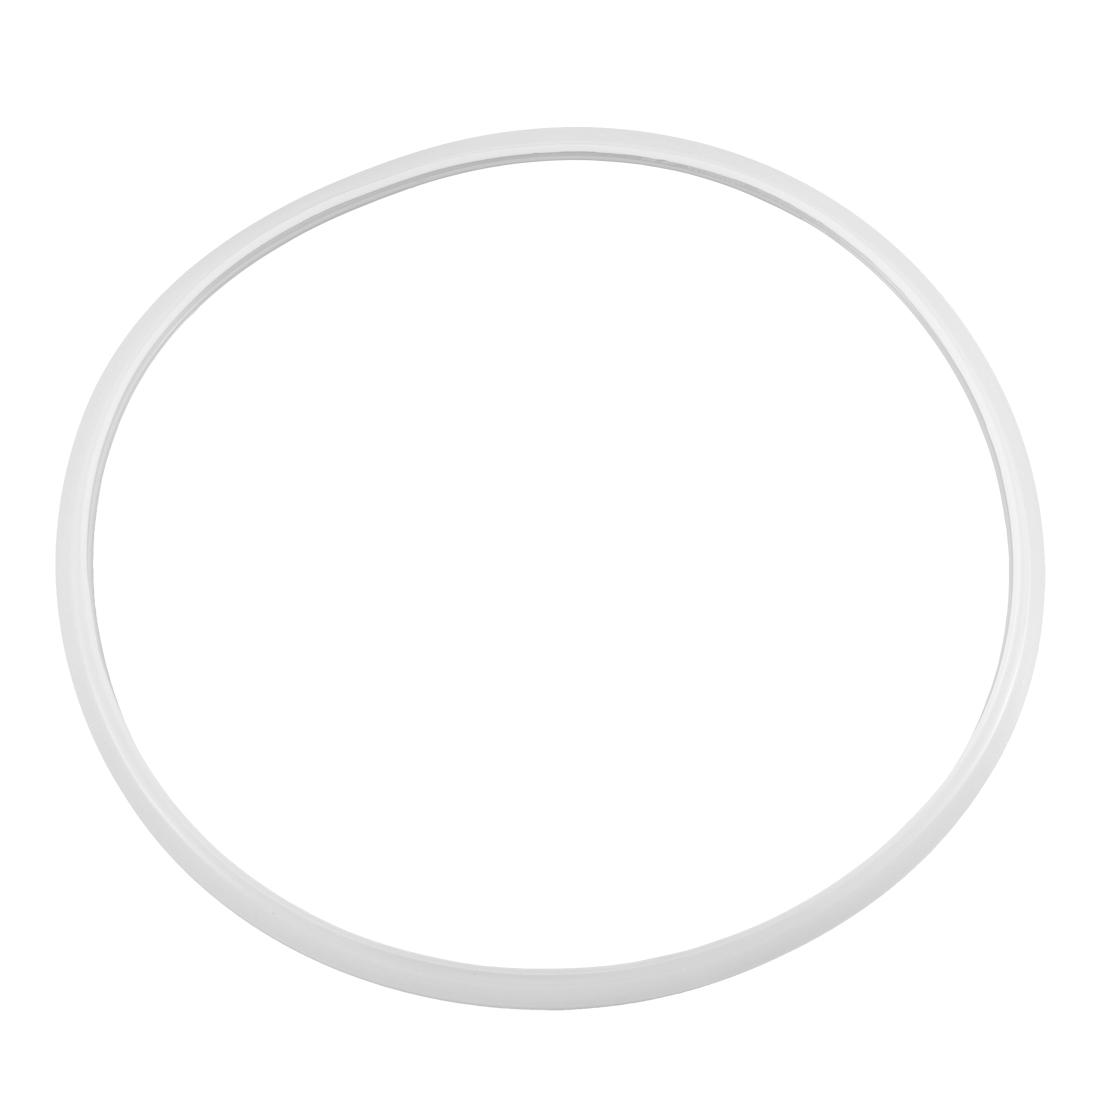 32cm Internal 35cm External Dia Sealing Gasket Ring for Pressure Cooker